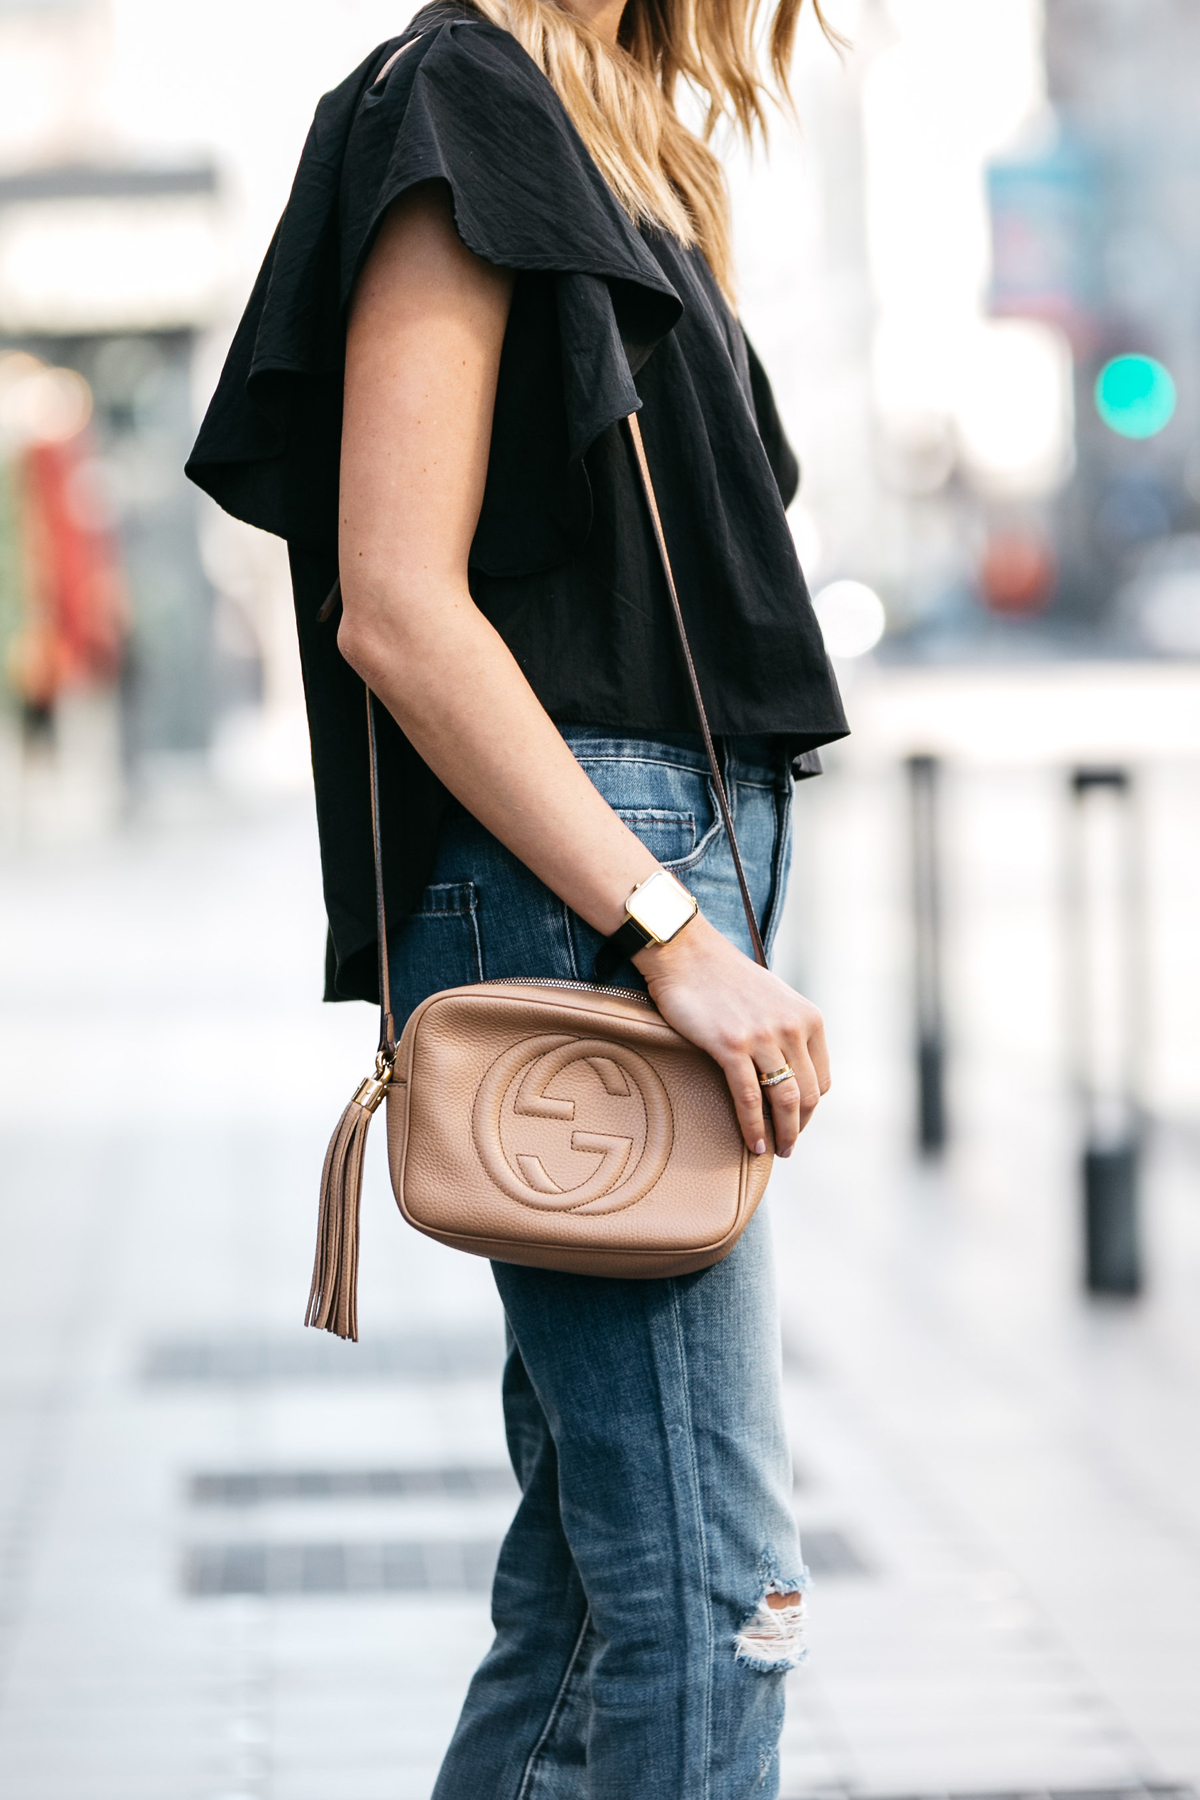 Black Ruffle Sleeve Top, Ripped Skinny Crop Jeans, Gucci Soho Disco Handbag